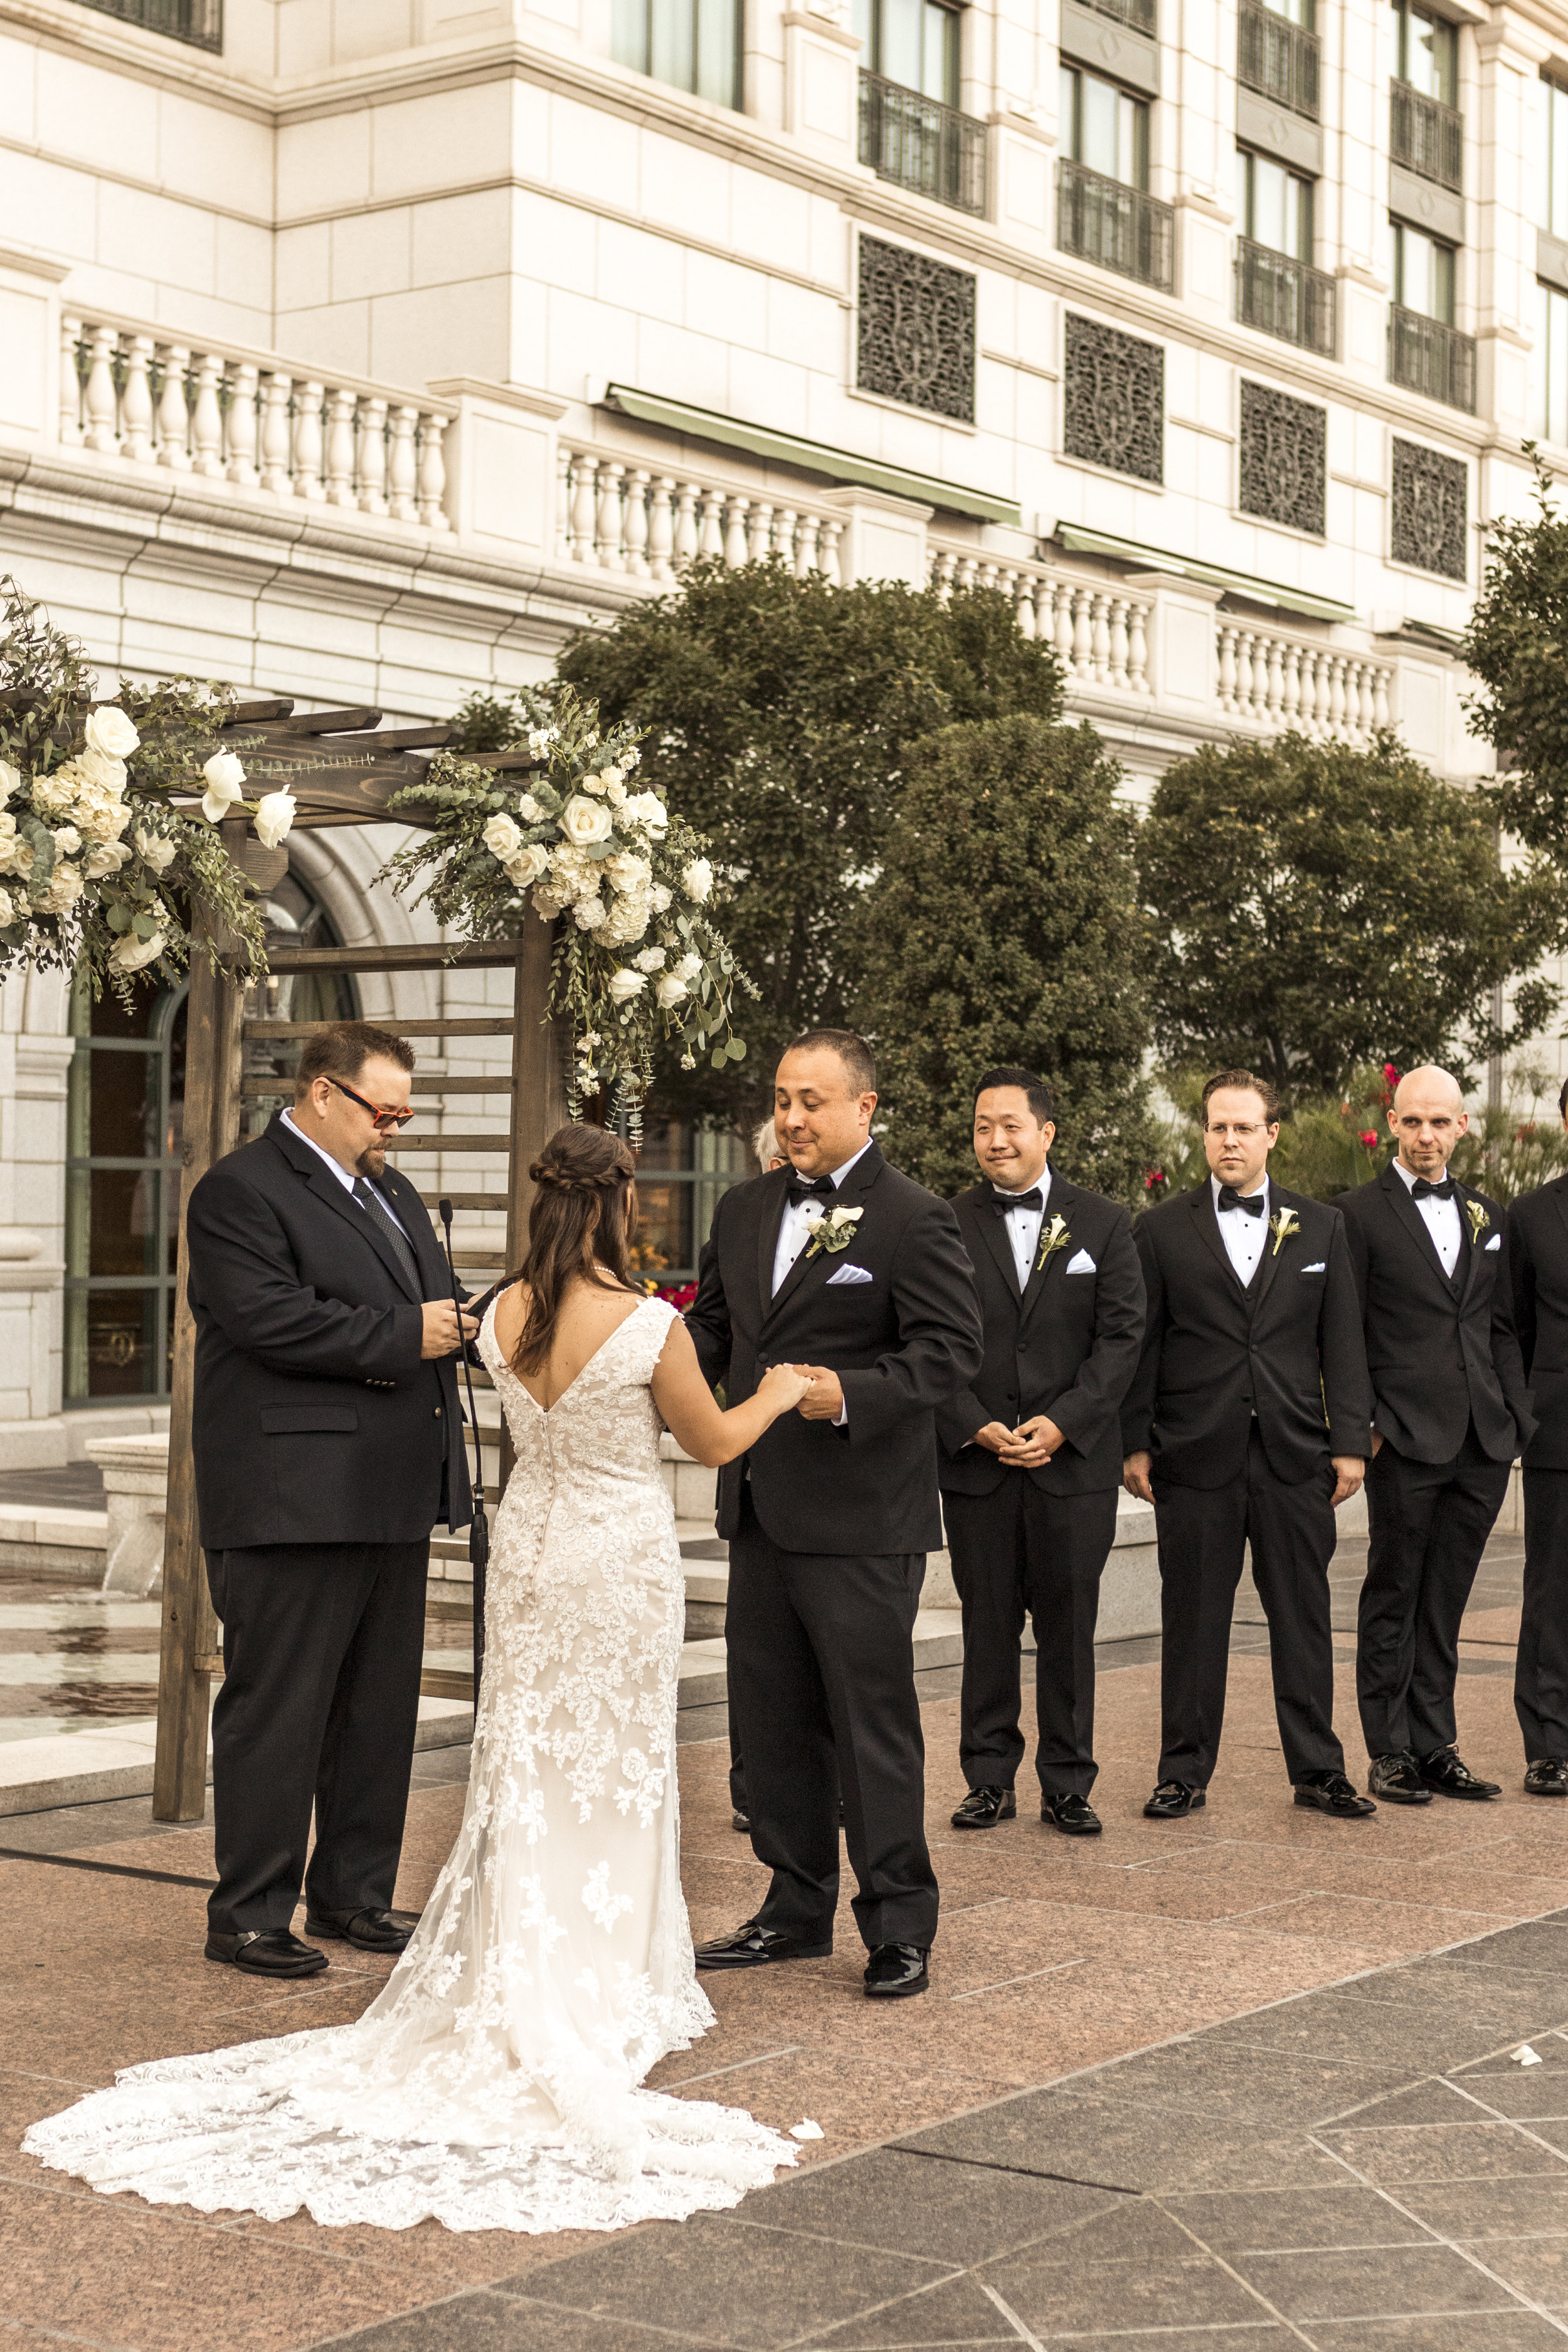 Grand America Hotel High End Wedding  Salt Lake City, Utah   Bri Bergman Photography 029.JPG